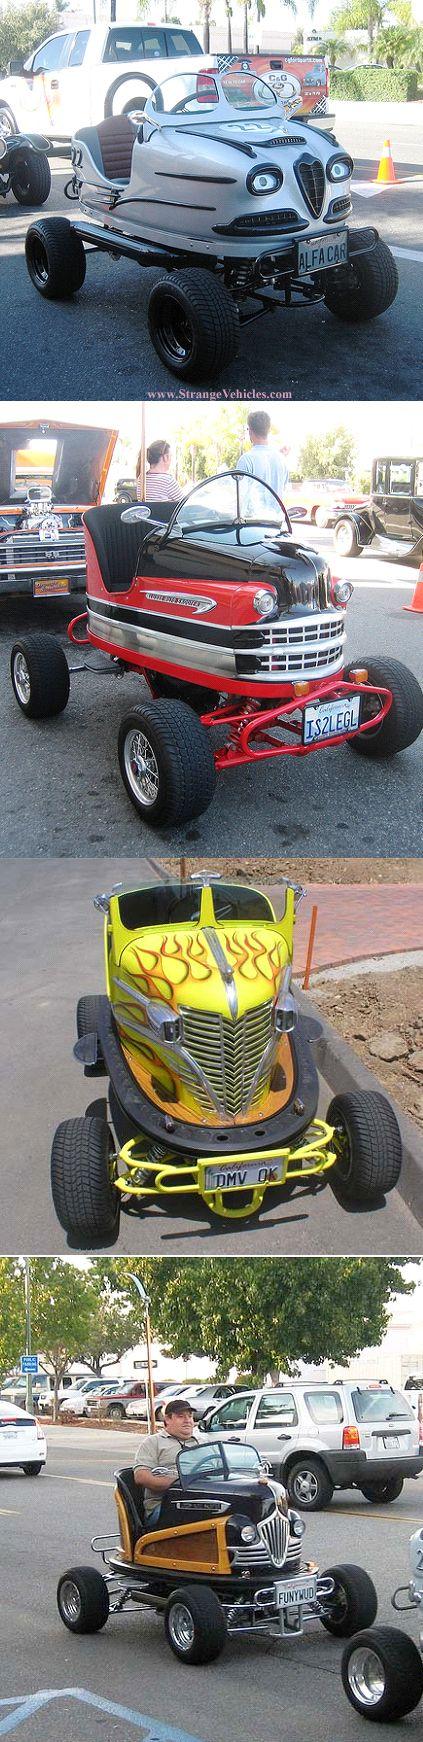 Bad Boy Toys : Strange street legal bumper cars trucks etc